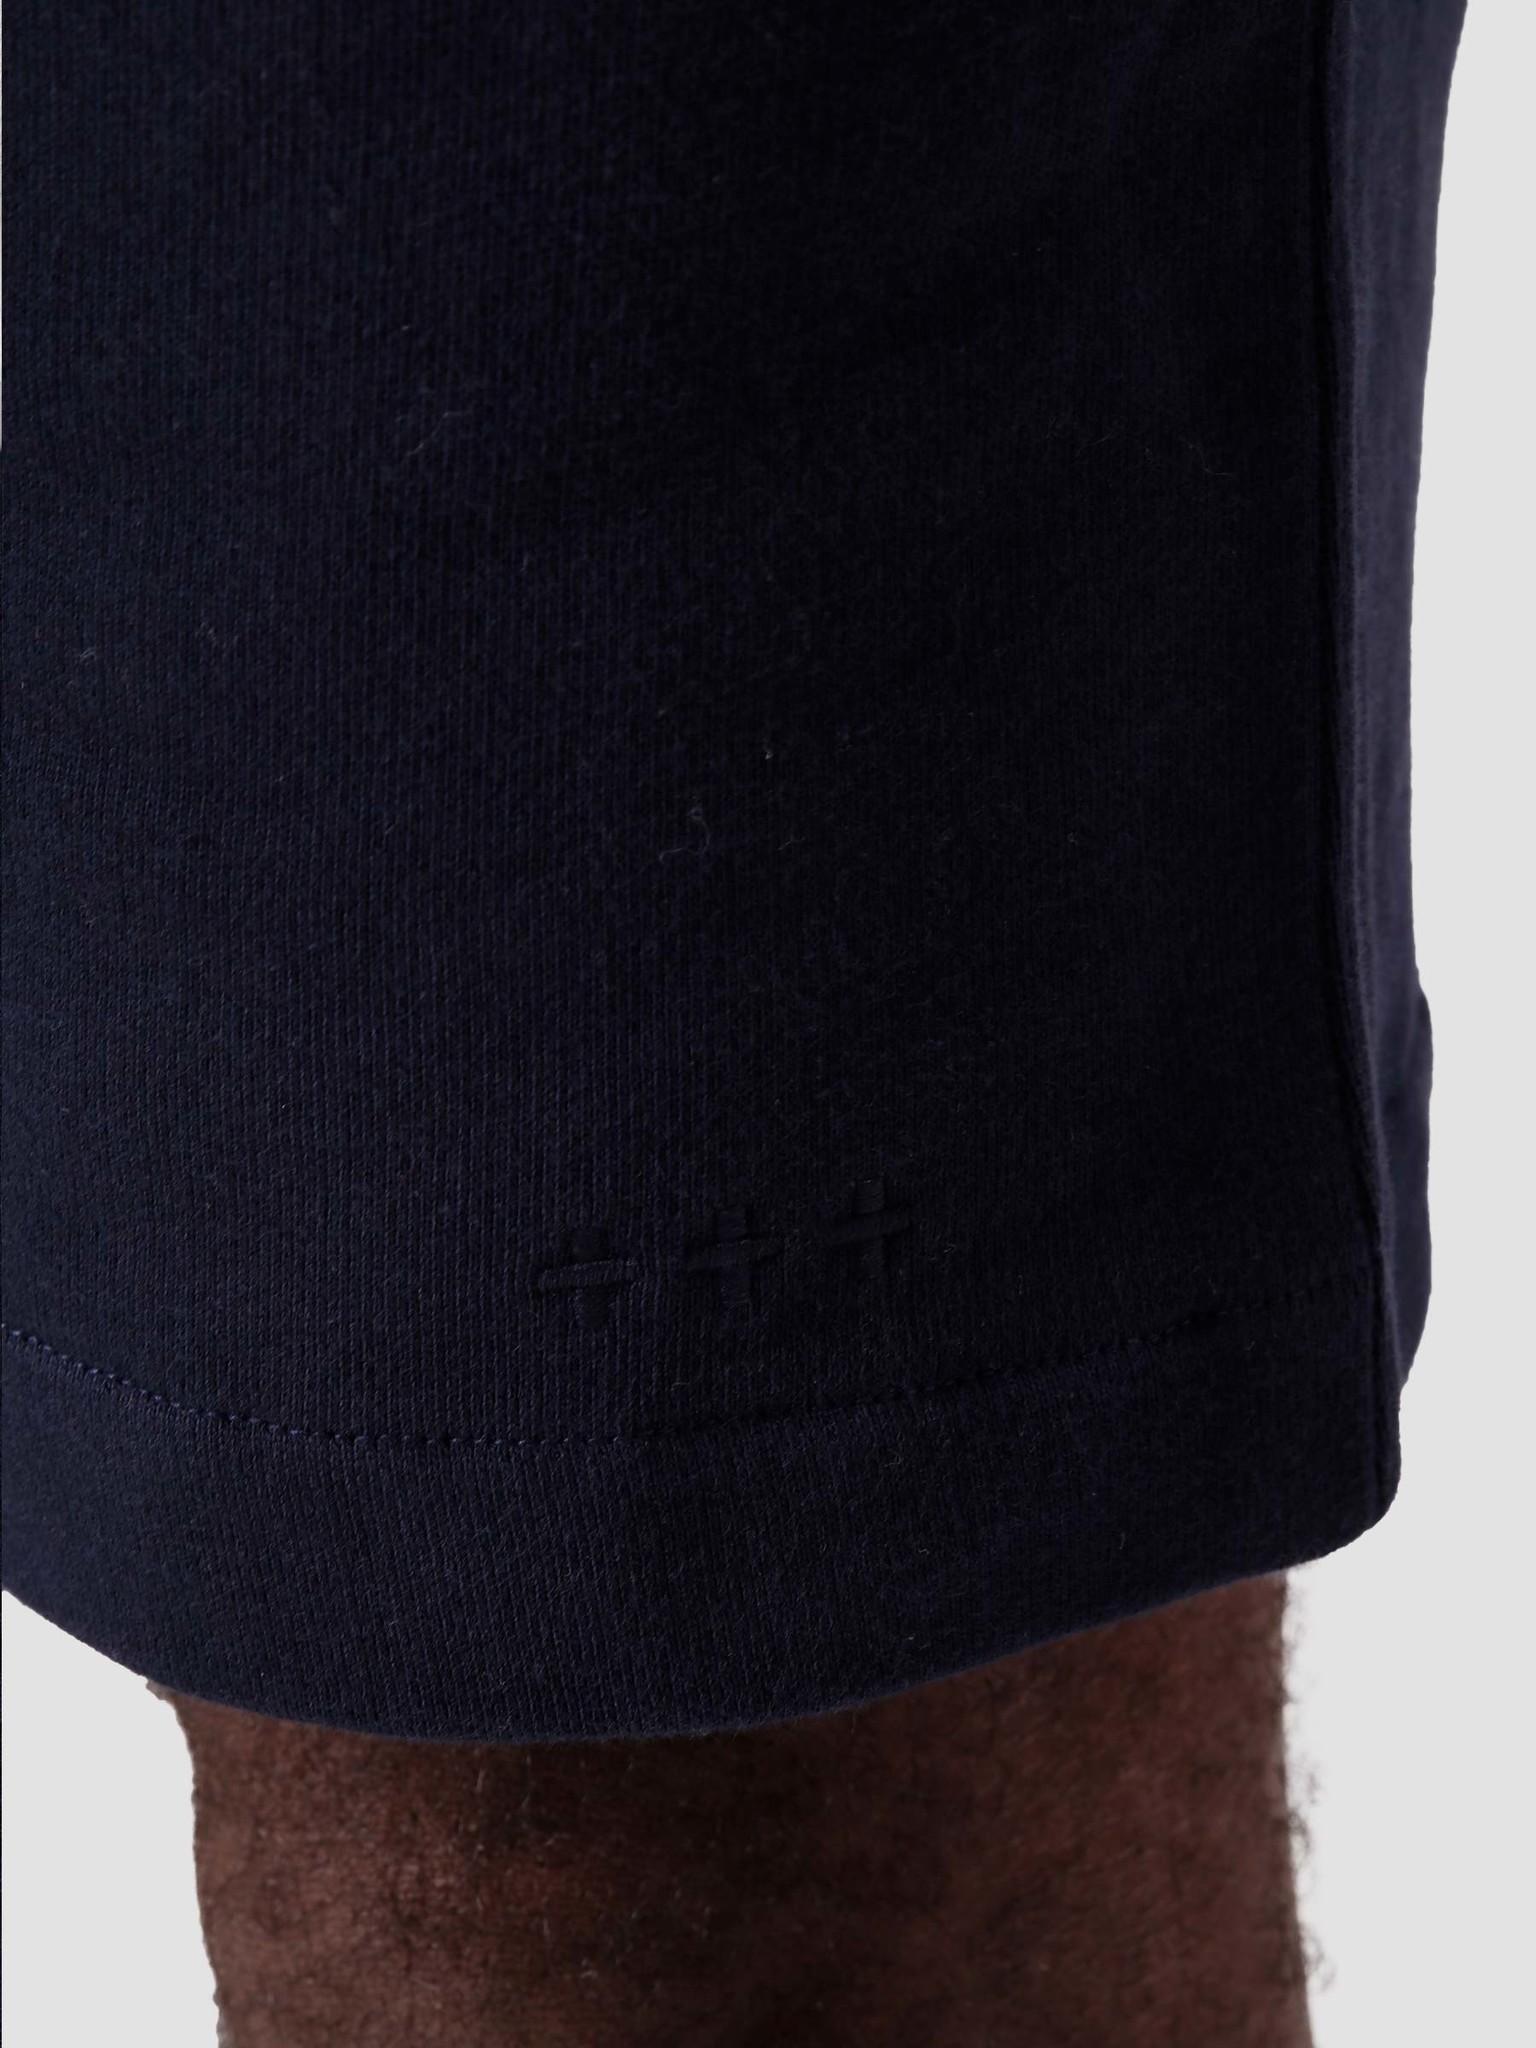 Quality Blanks Quality Blanks QB30 Sweat Short Dark Sapphire